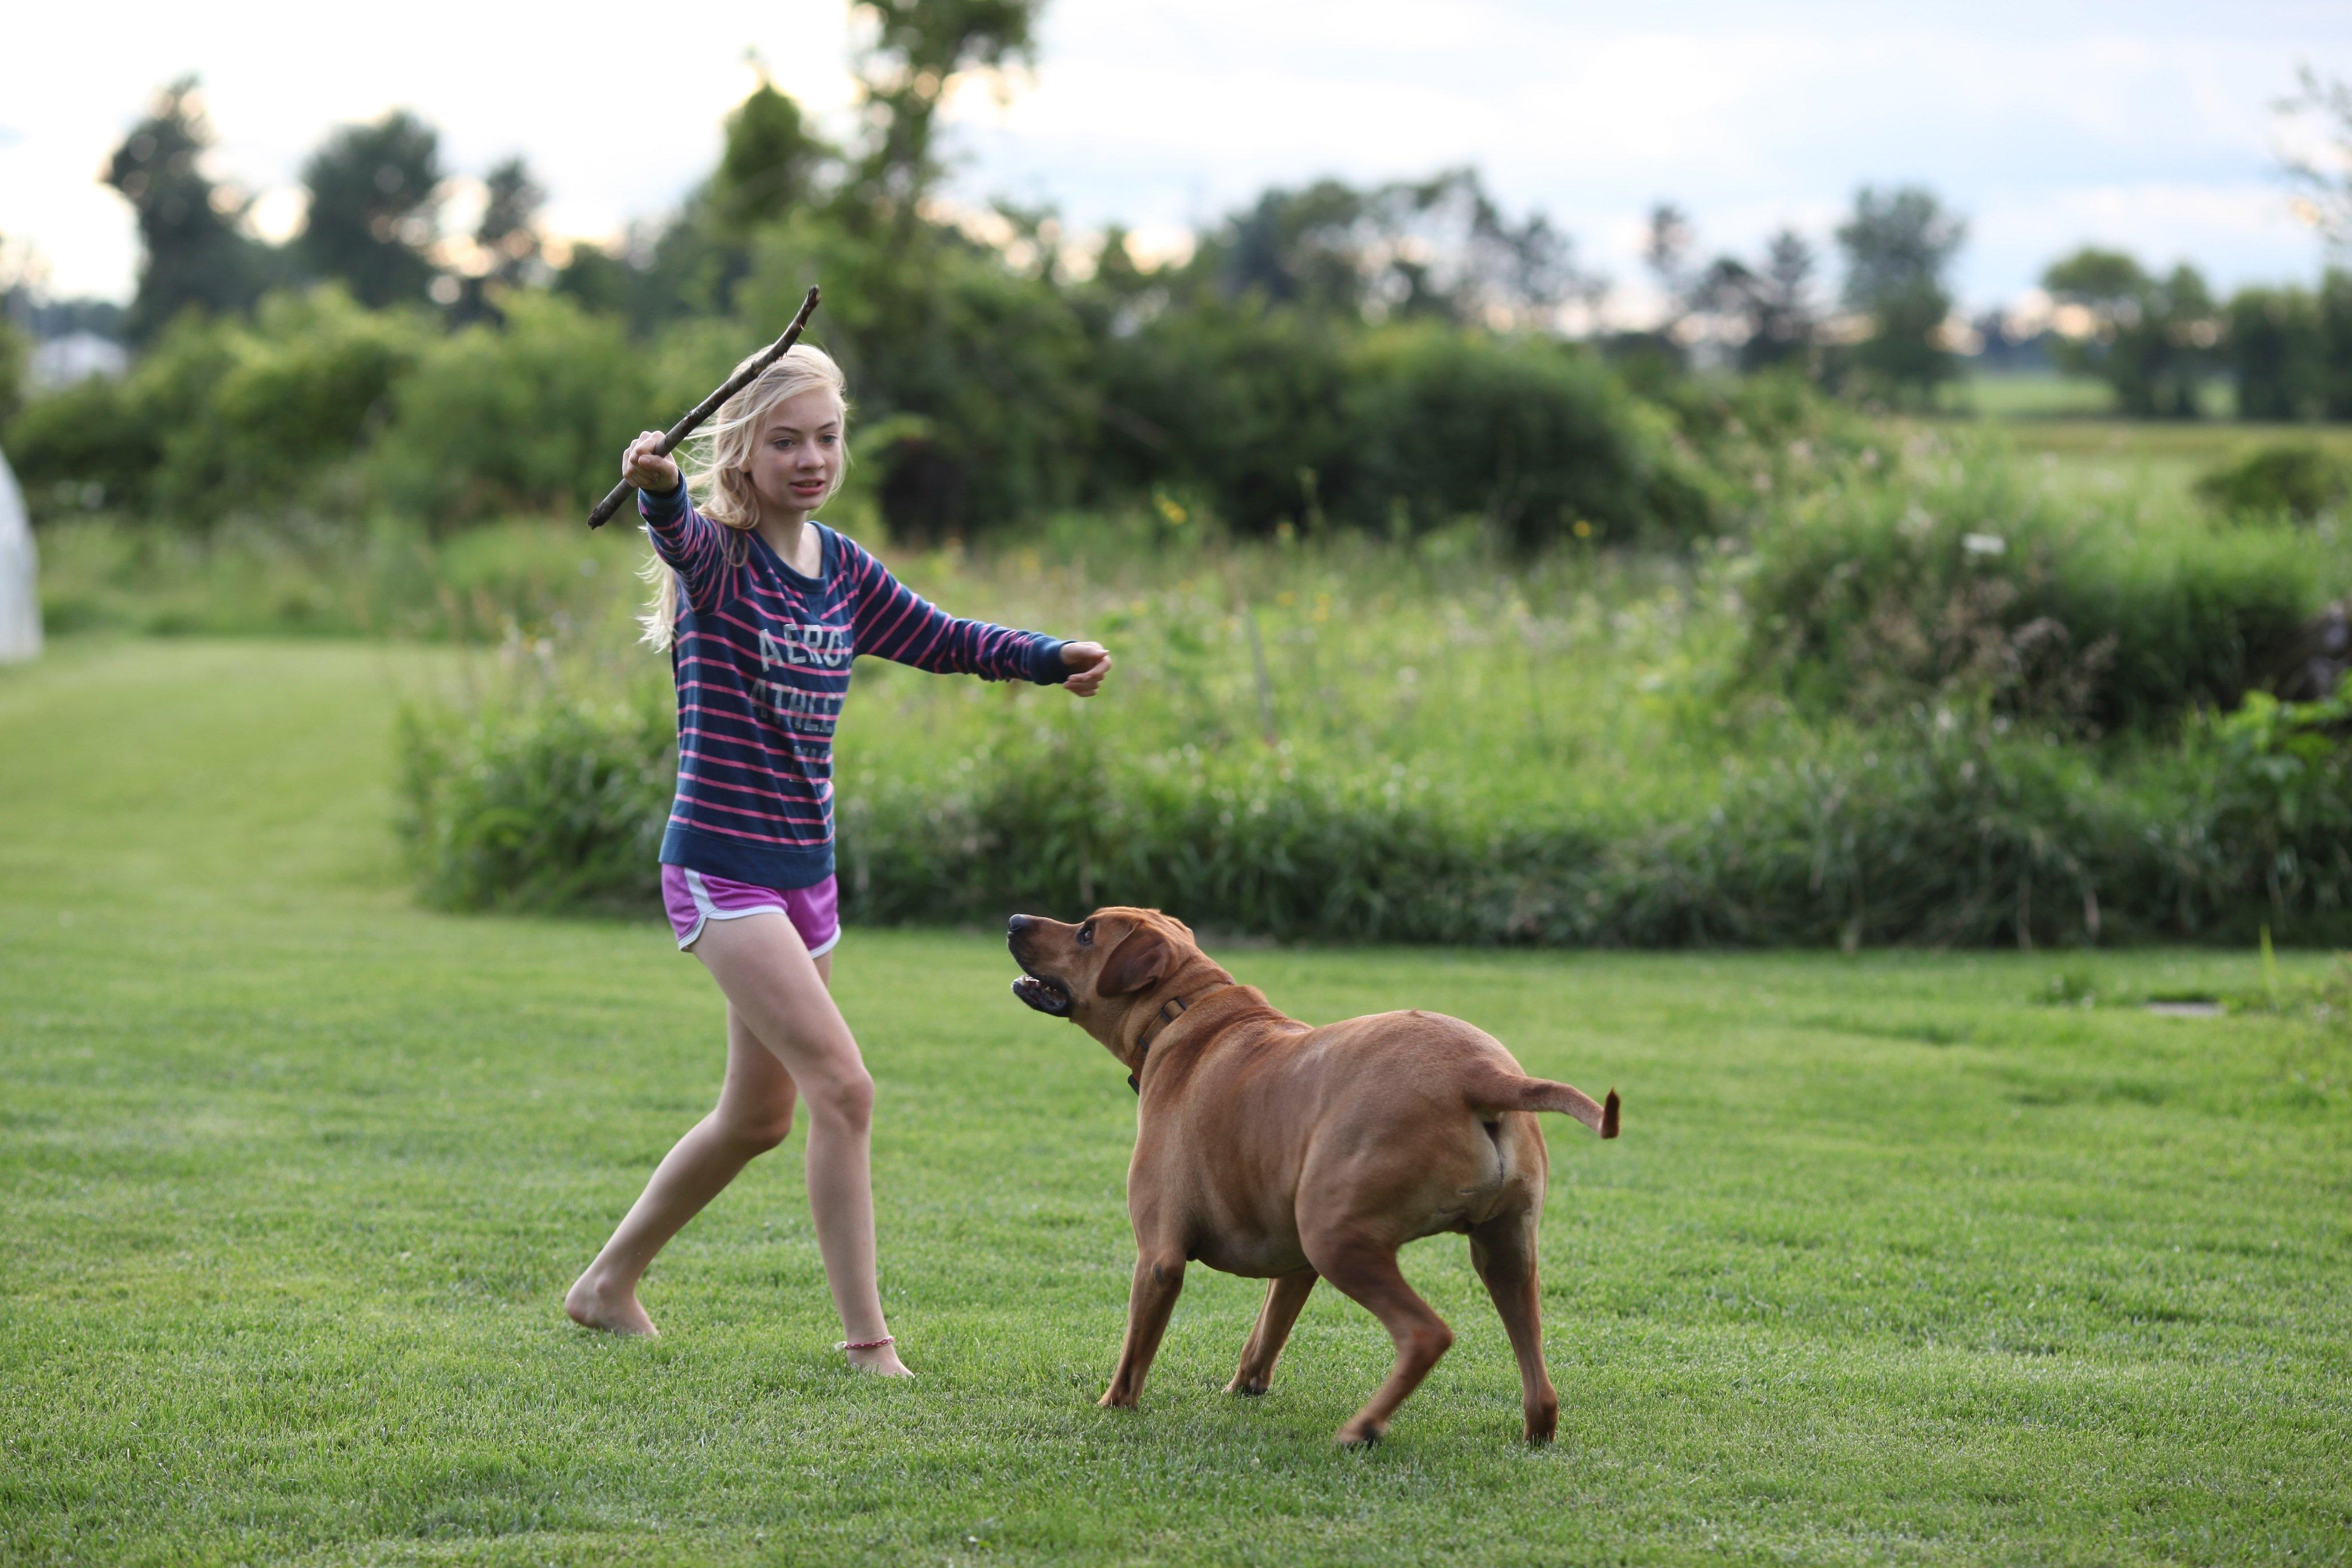 the magic flying dog #2